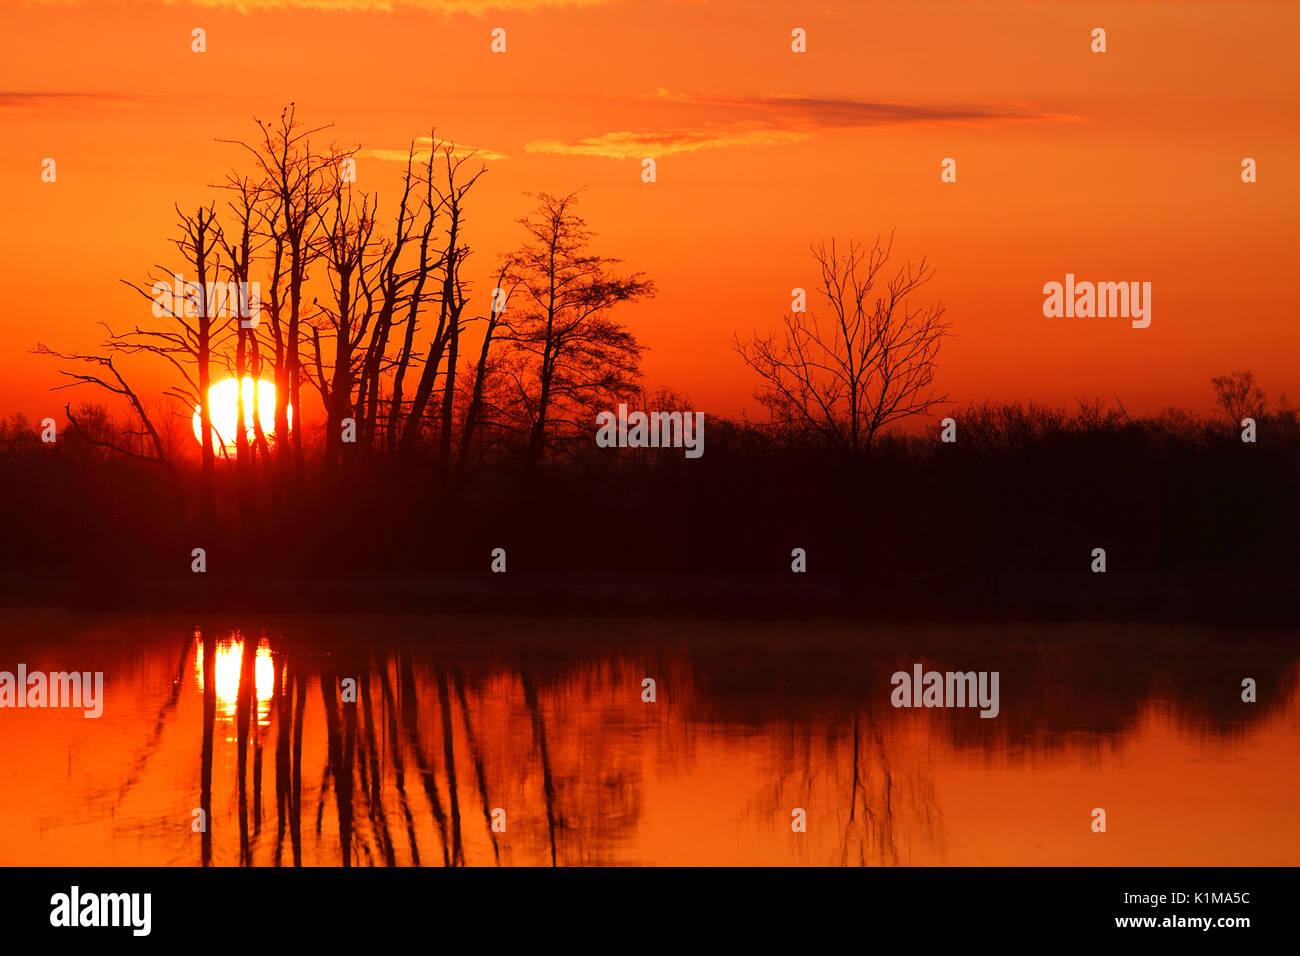 Sunrise over the Peene, natural park river Flußlandschaft Peenetal, Mecklenburg-Western Pomerania, Germany - Stock Image